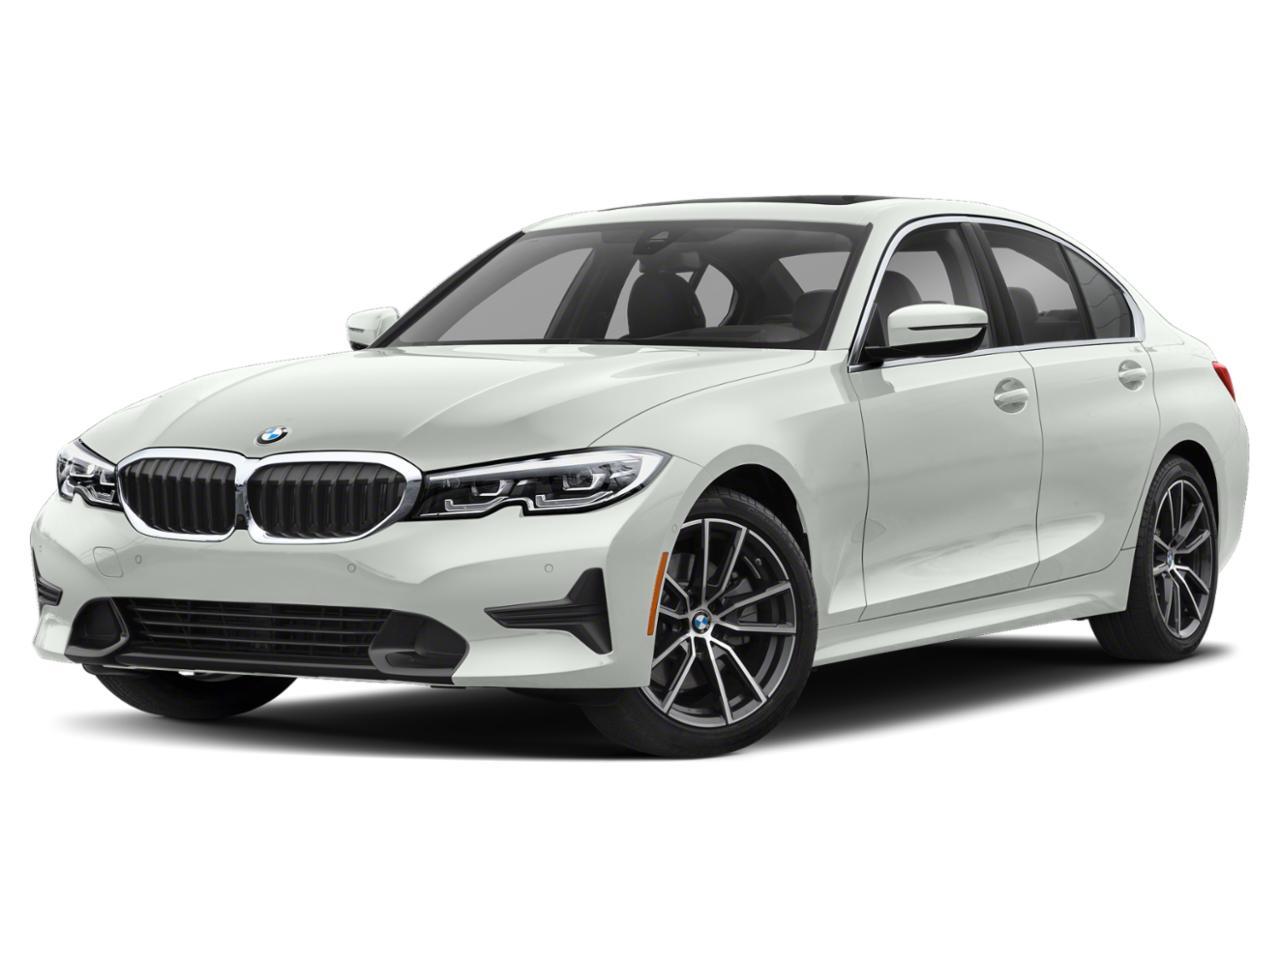 2021 BMW 330i Vehicle Photo in Grapevine, TX 76051